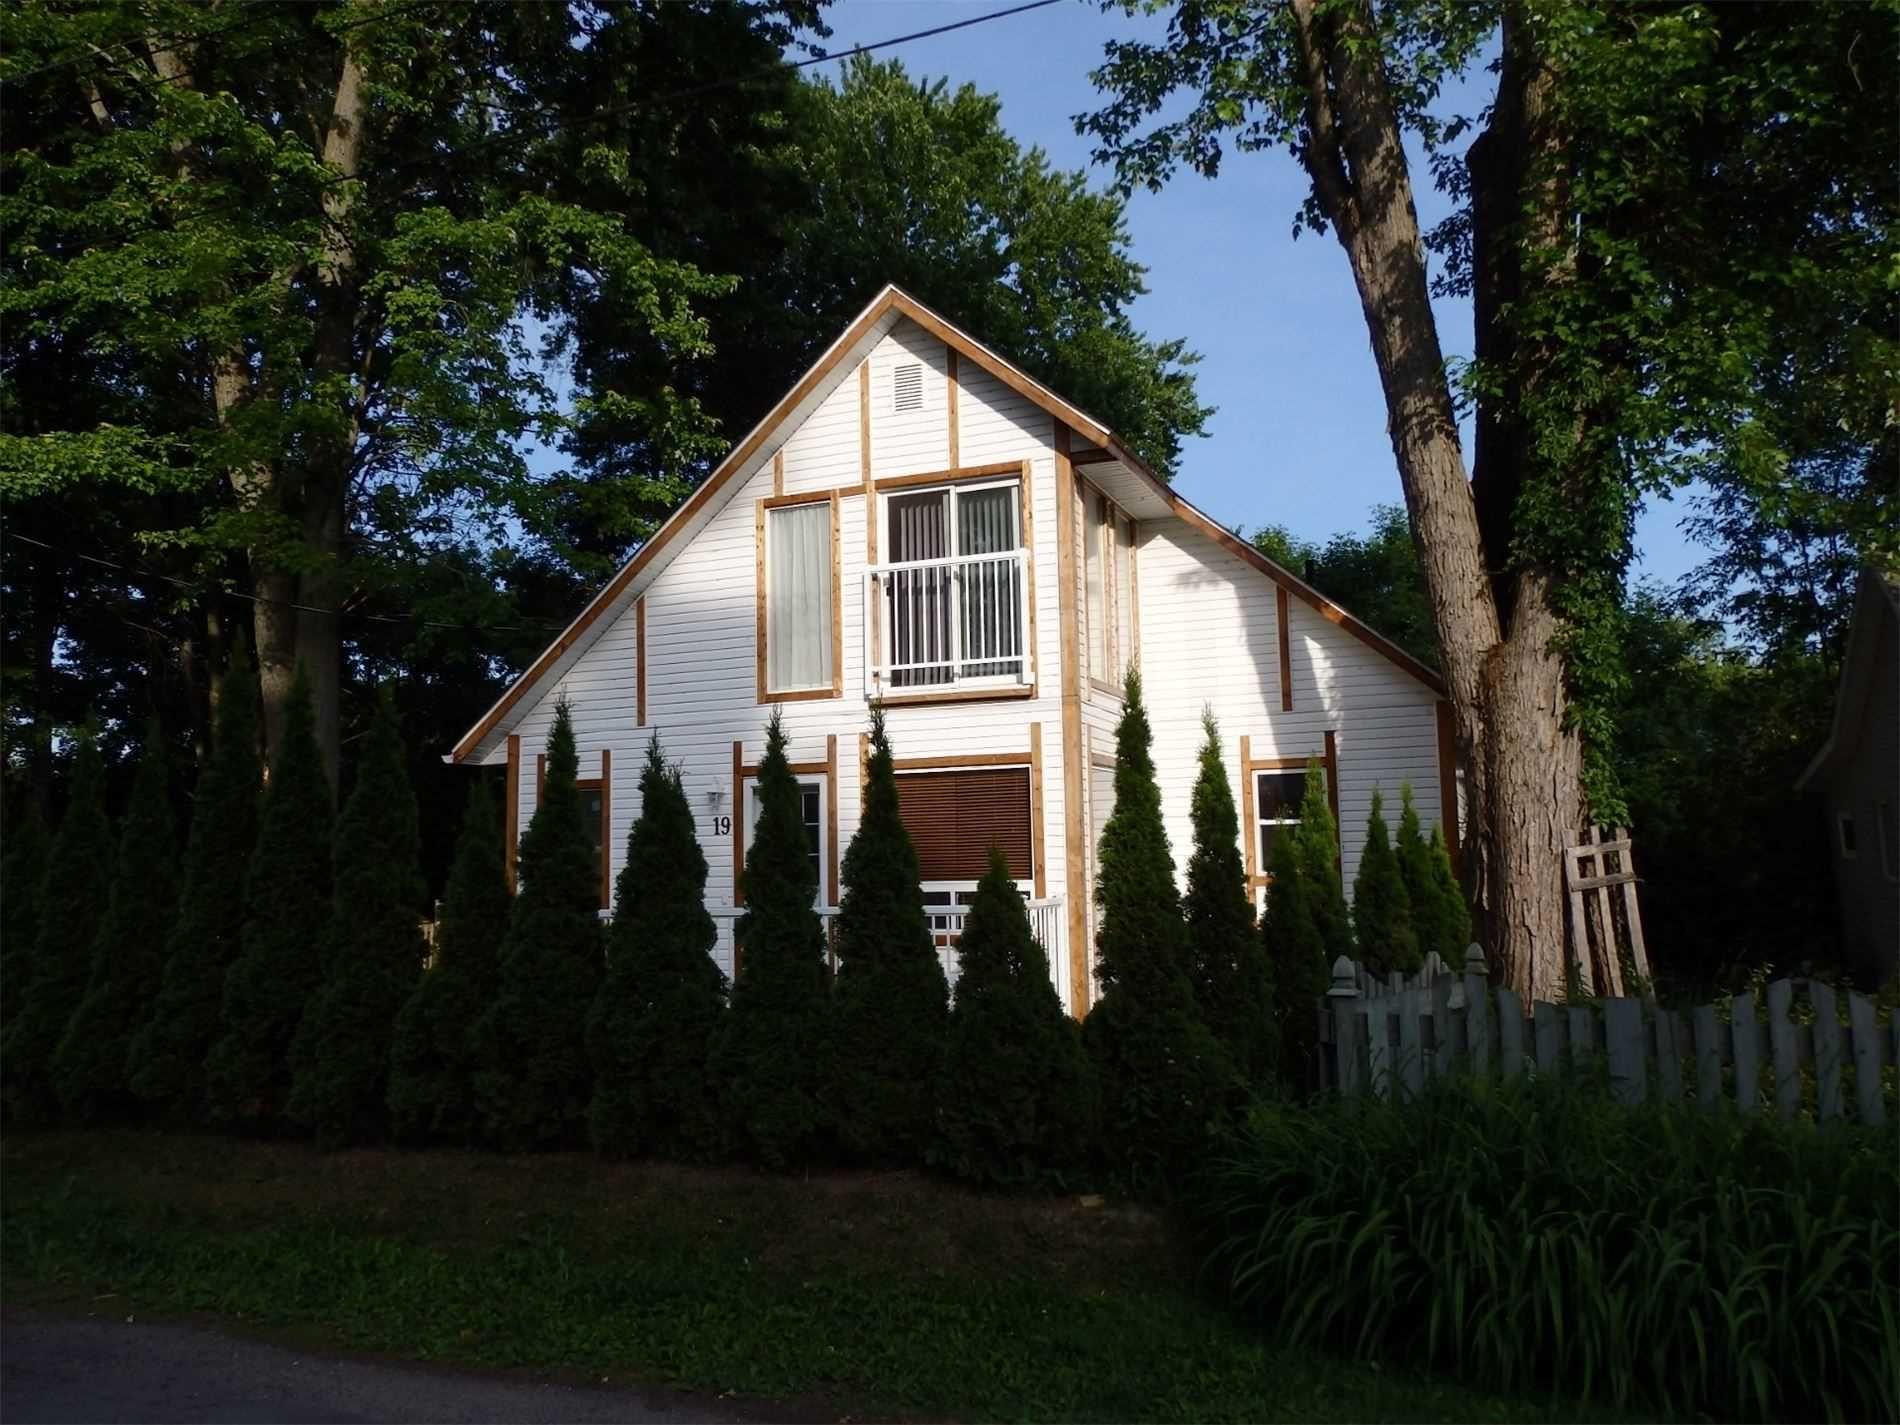 Main Photo: 19 Ridge Avenue in Ramara: Brechin House (2-Storey) for sale : MLS®# S5185665